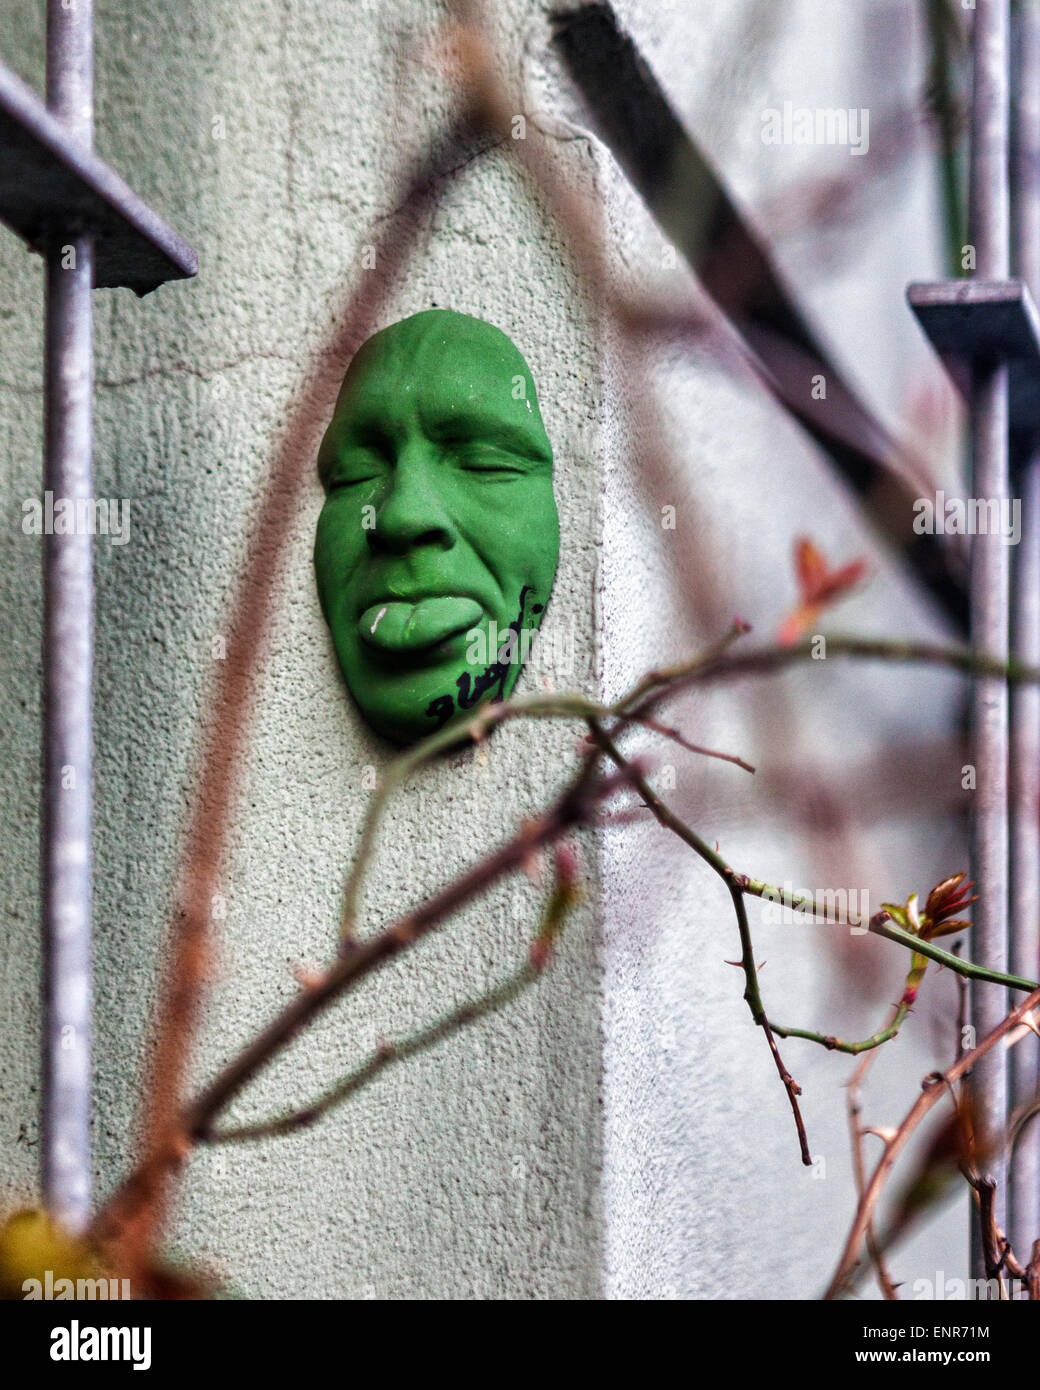 Urban street art - green 3-D self portrait, a face sculpture by Gregos on a city building, Berlin - Stock Image